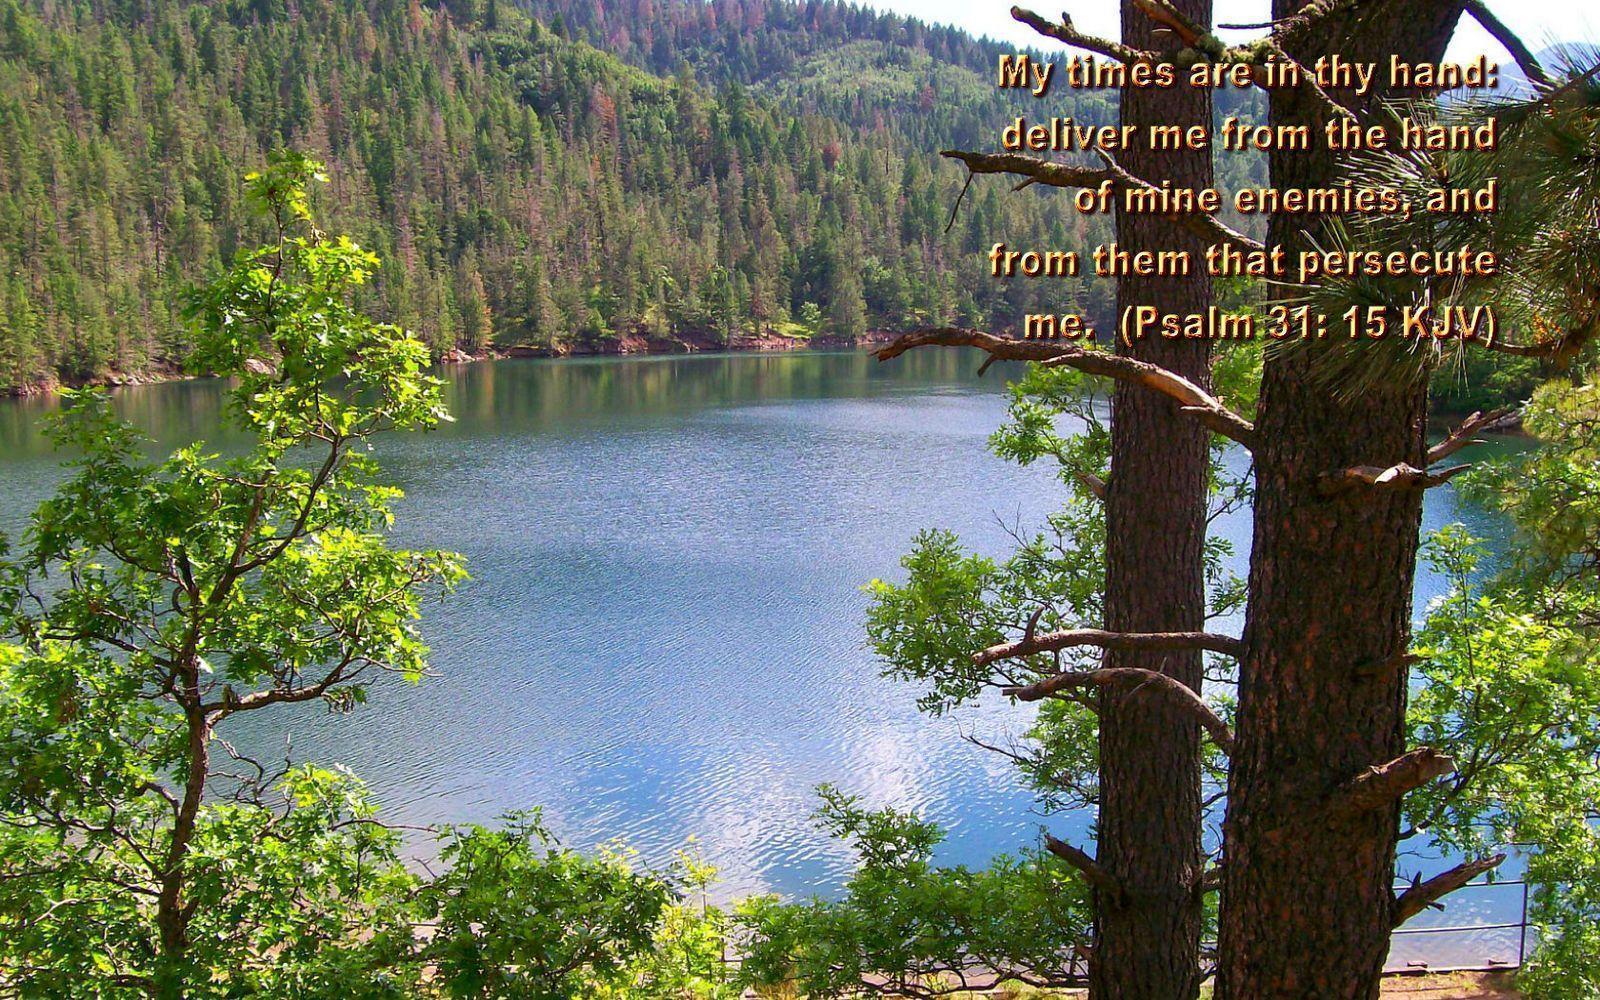 Free Desktop Wallpaper Scripture Fall Inspiring Christian Quotes Wallpapers Wallpaper Cave